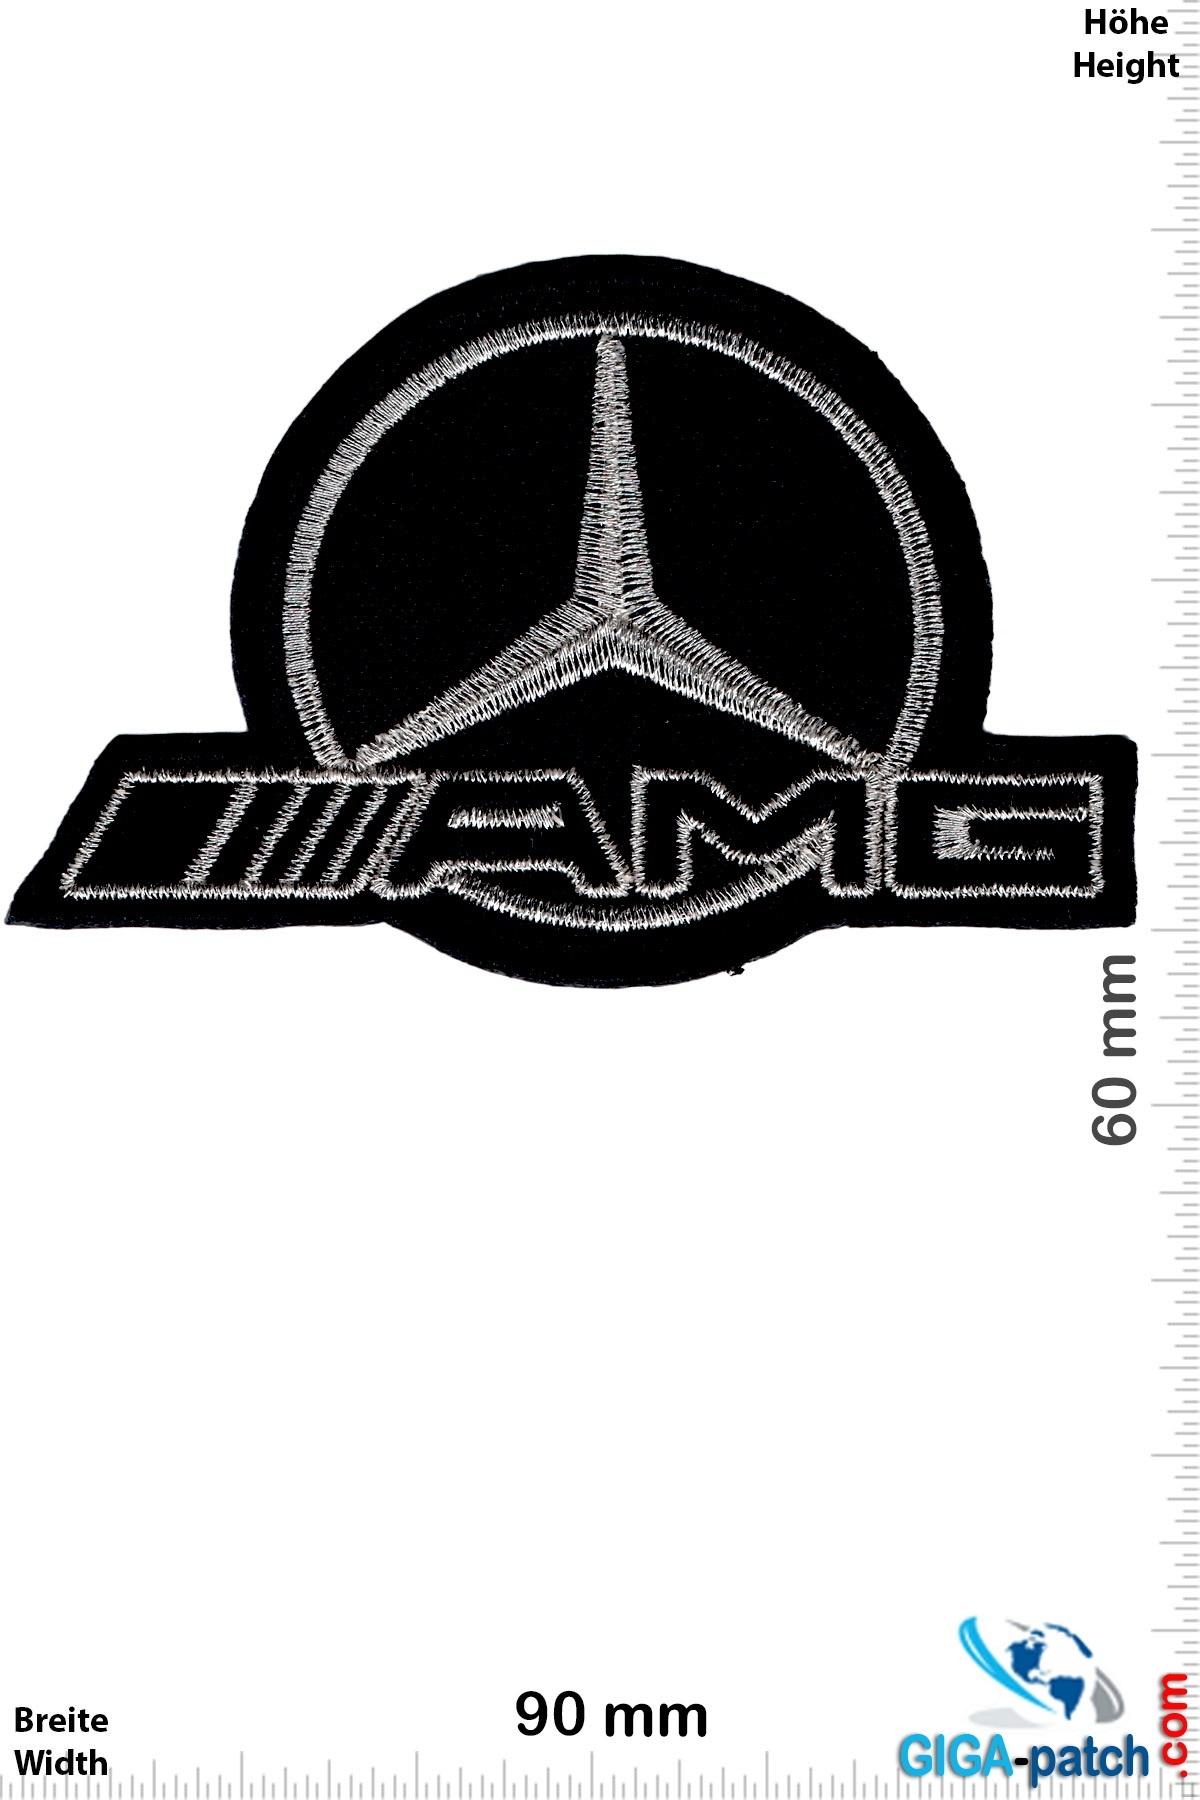 Mercedes Benz AMG - Mercedes Benz - silver